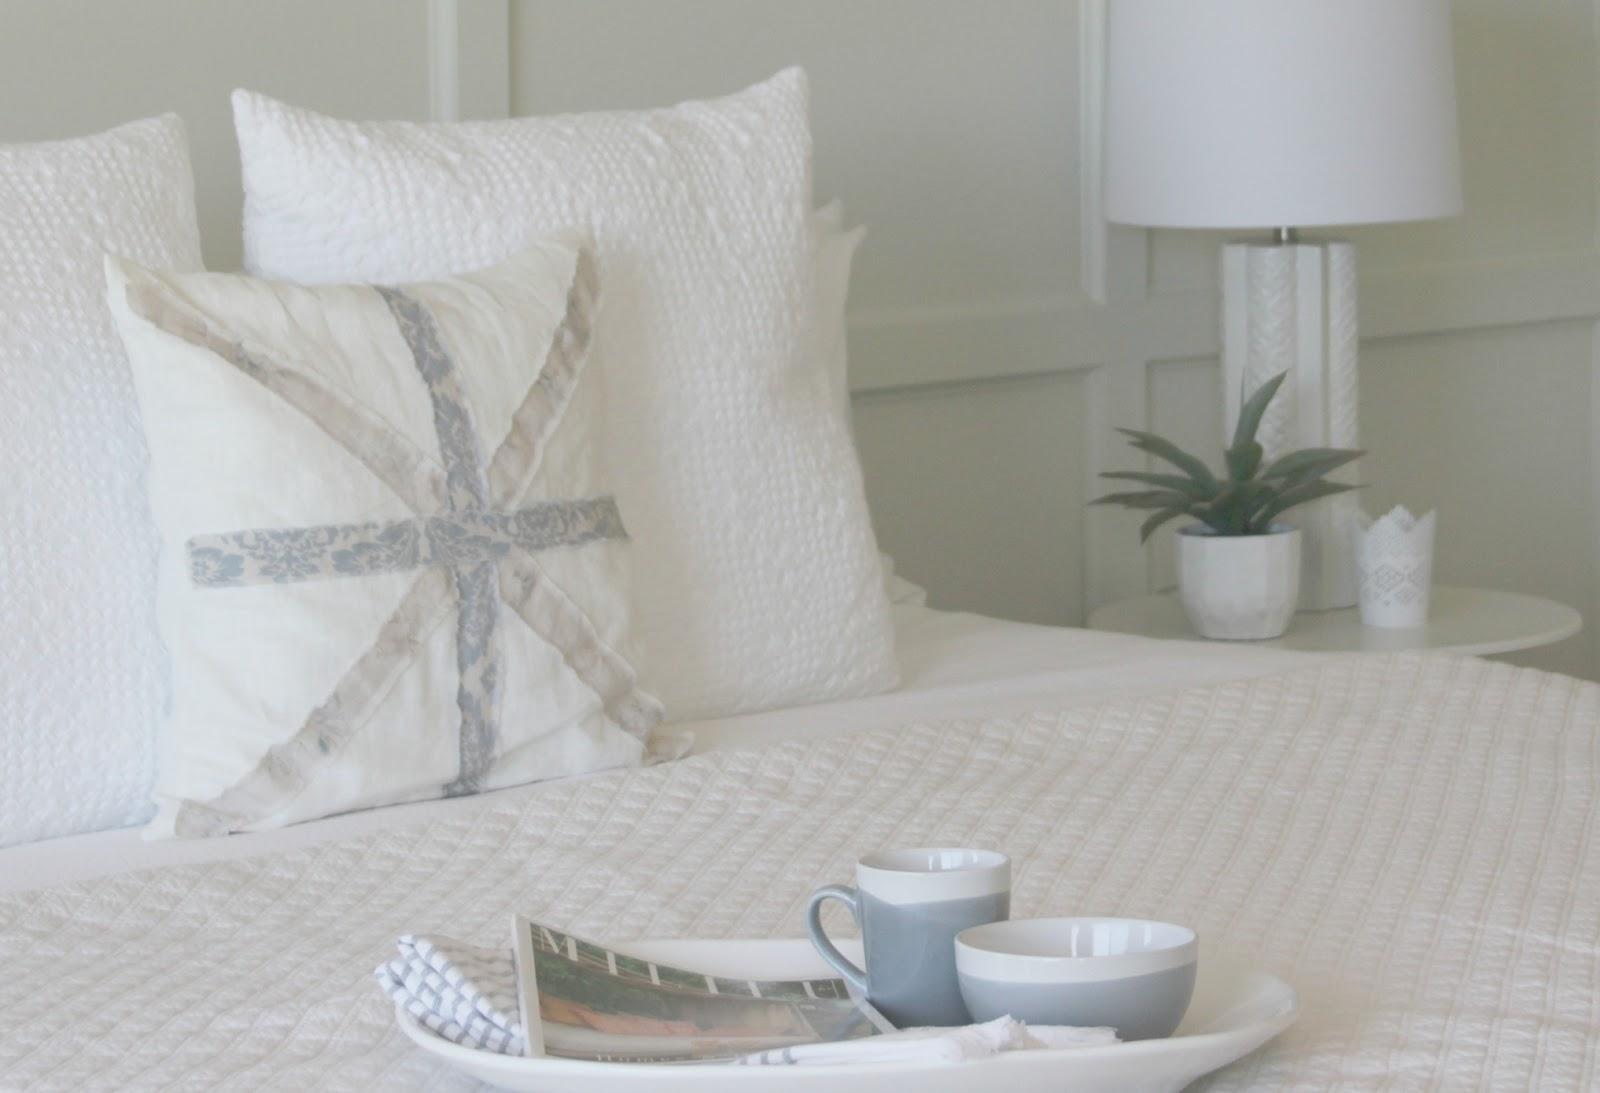 DIY bedroom decor makeover with serene, European inspired modern farmhouse style by Hello Lovely Studio